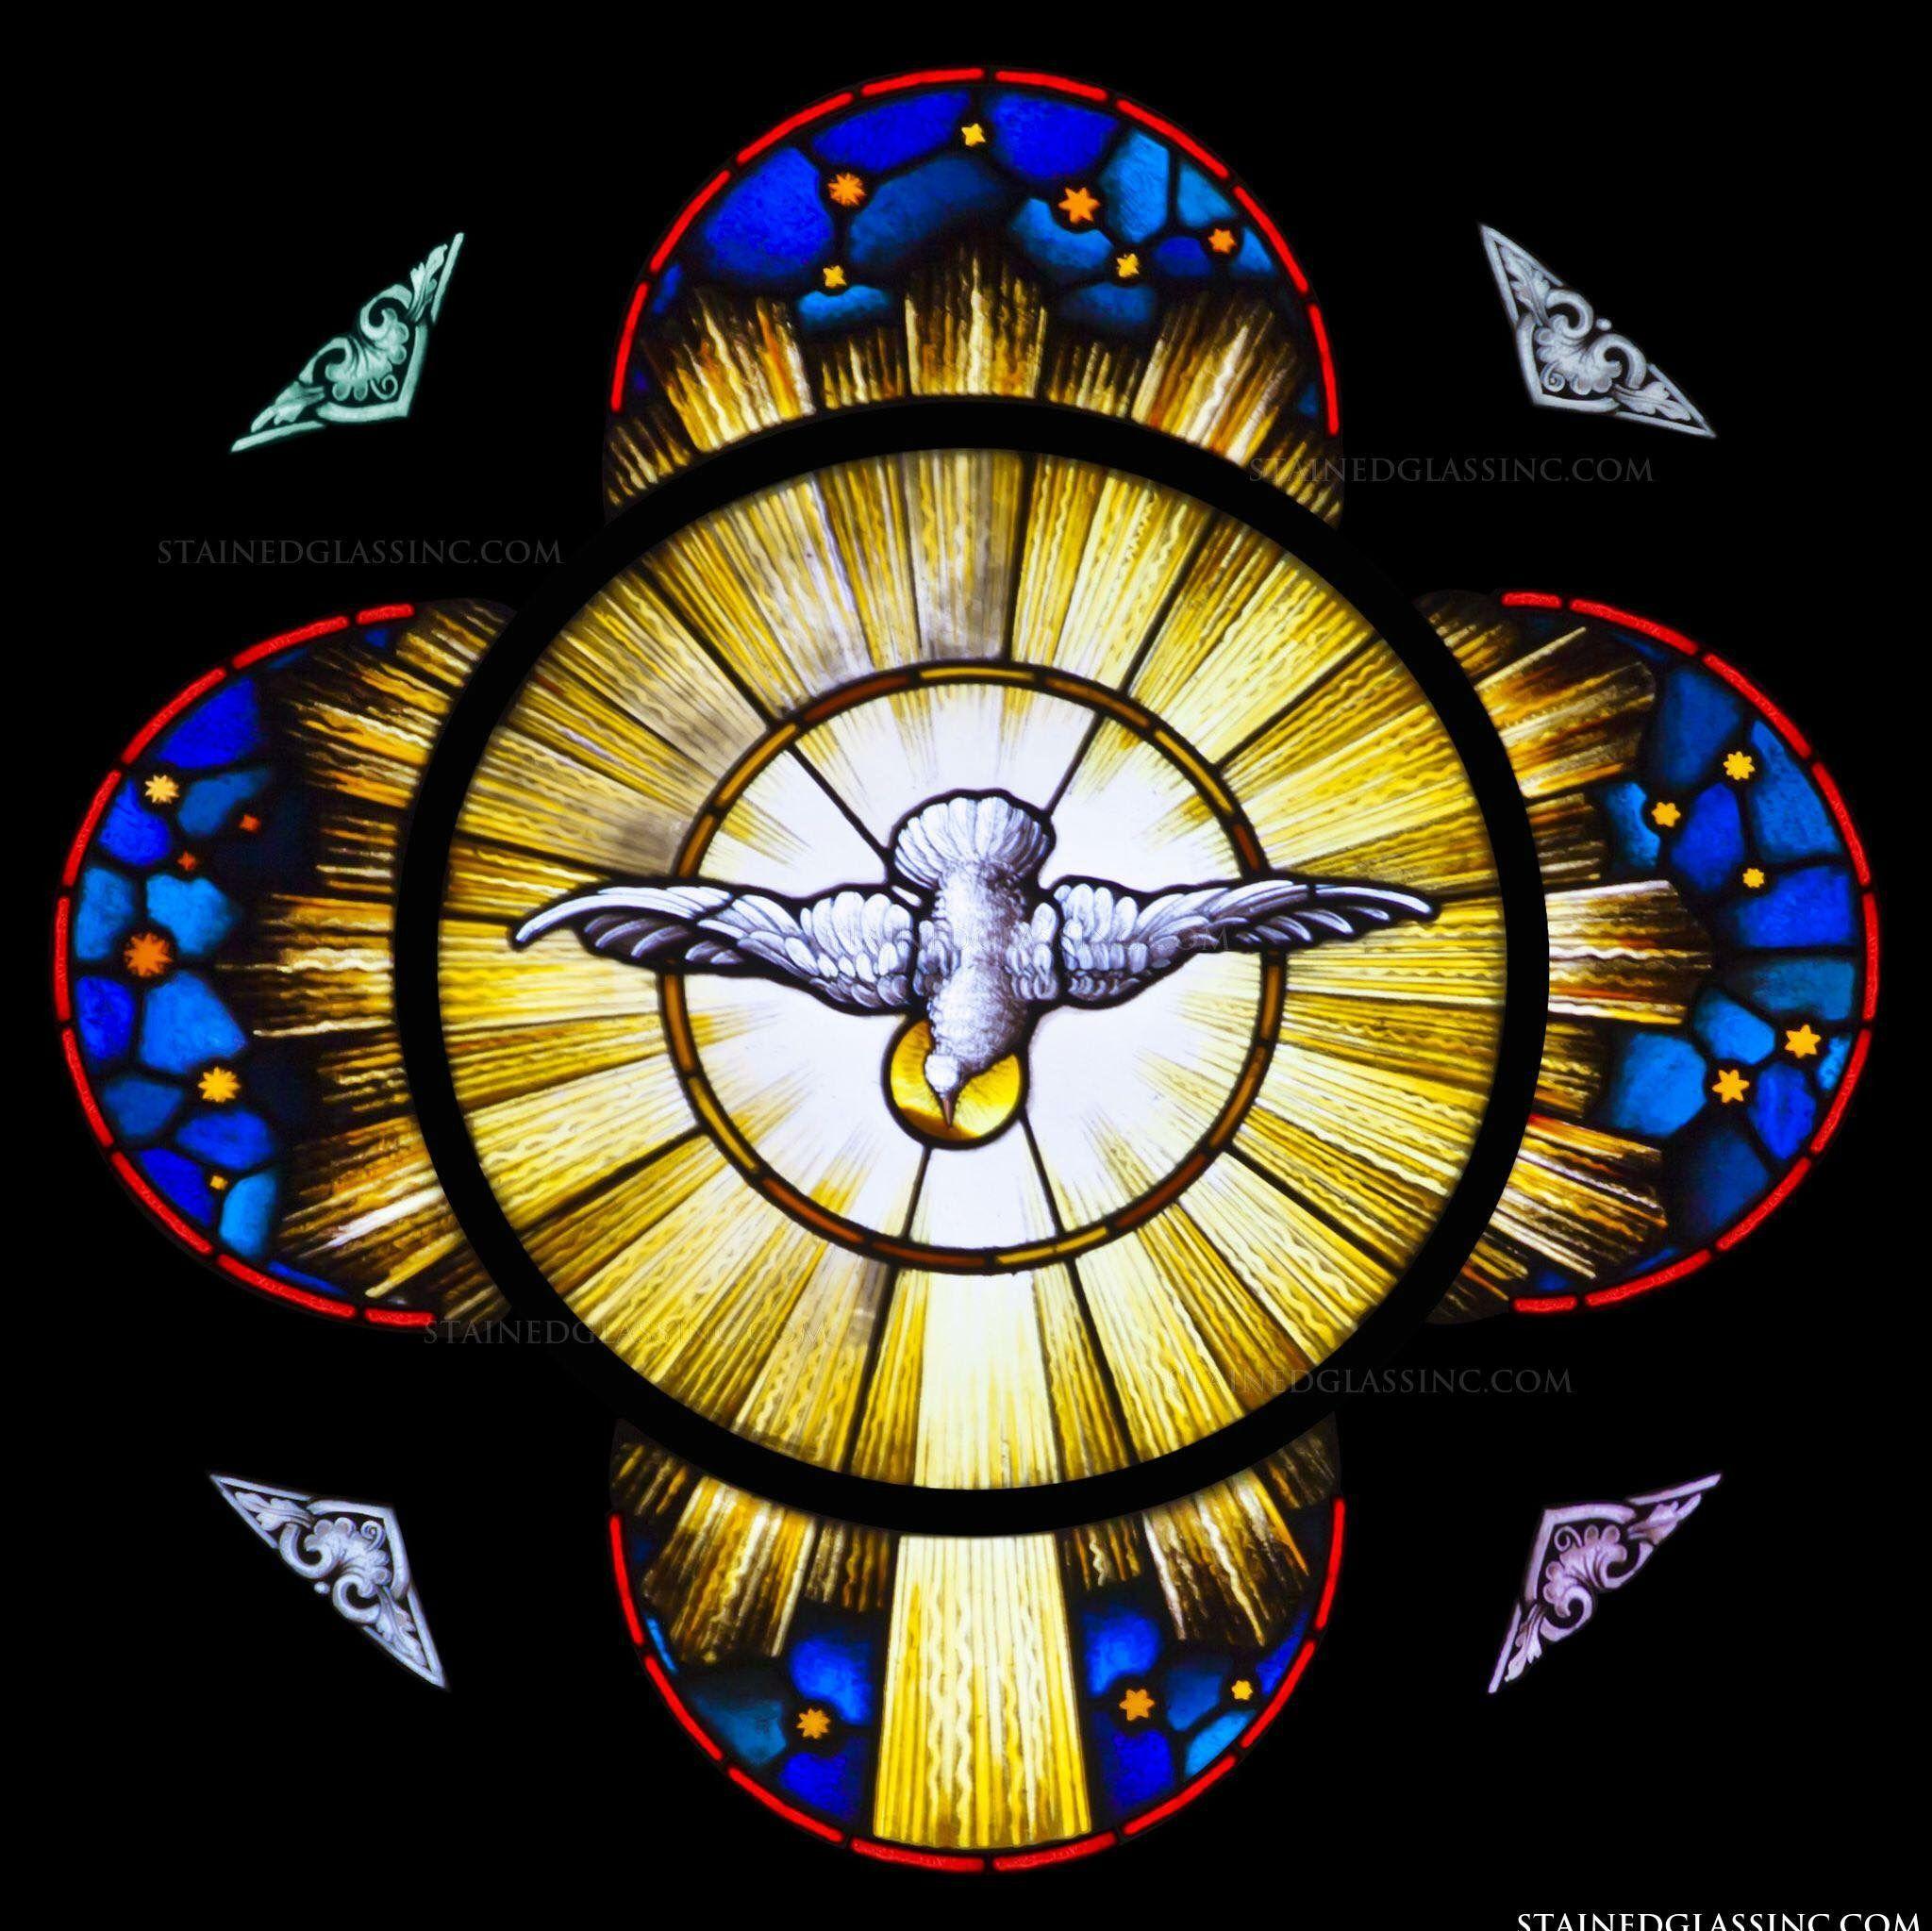 Pin by catholic on precious holy spirit paraclete